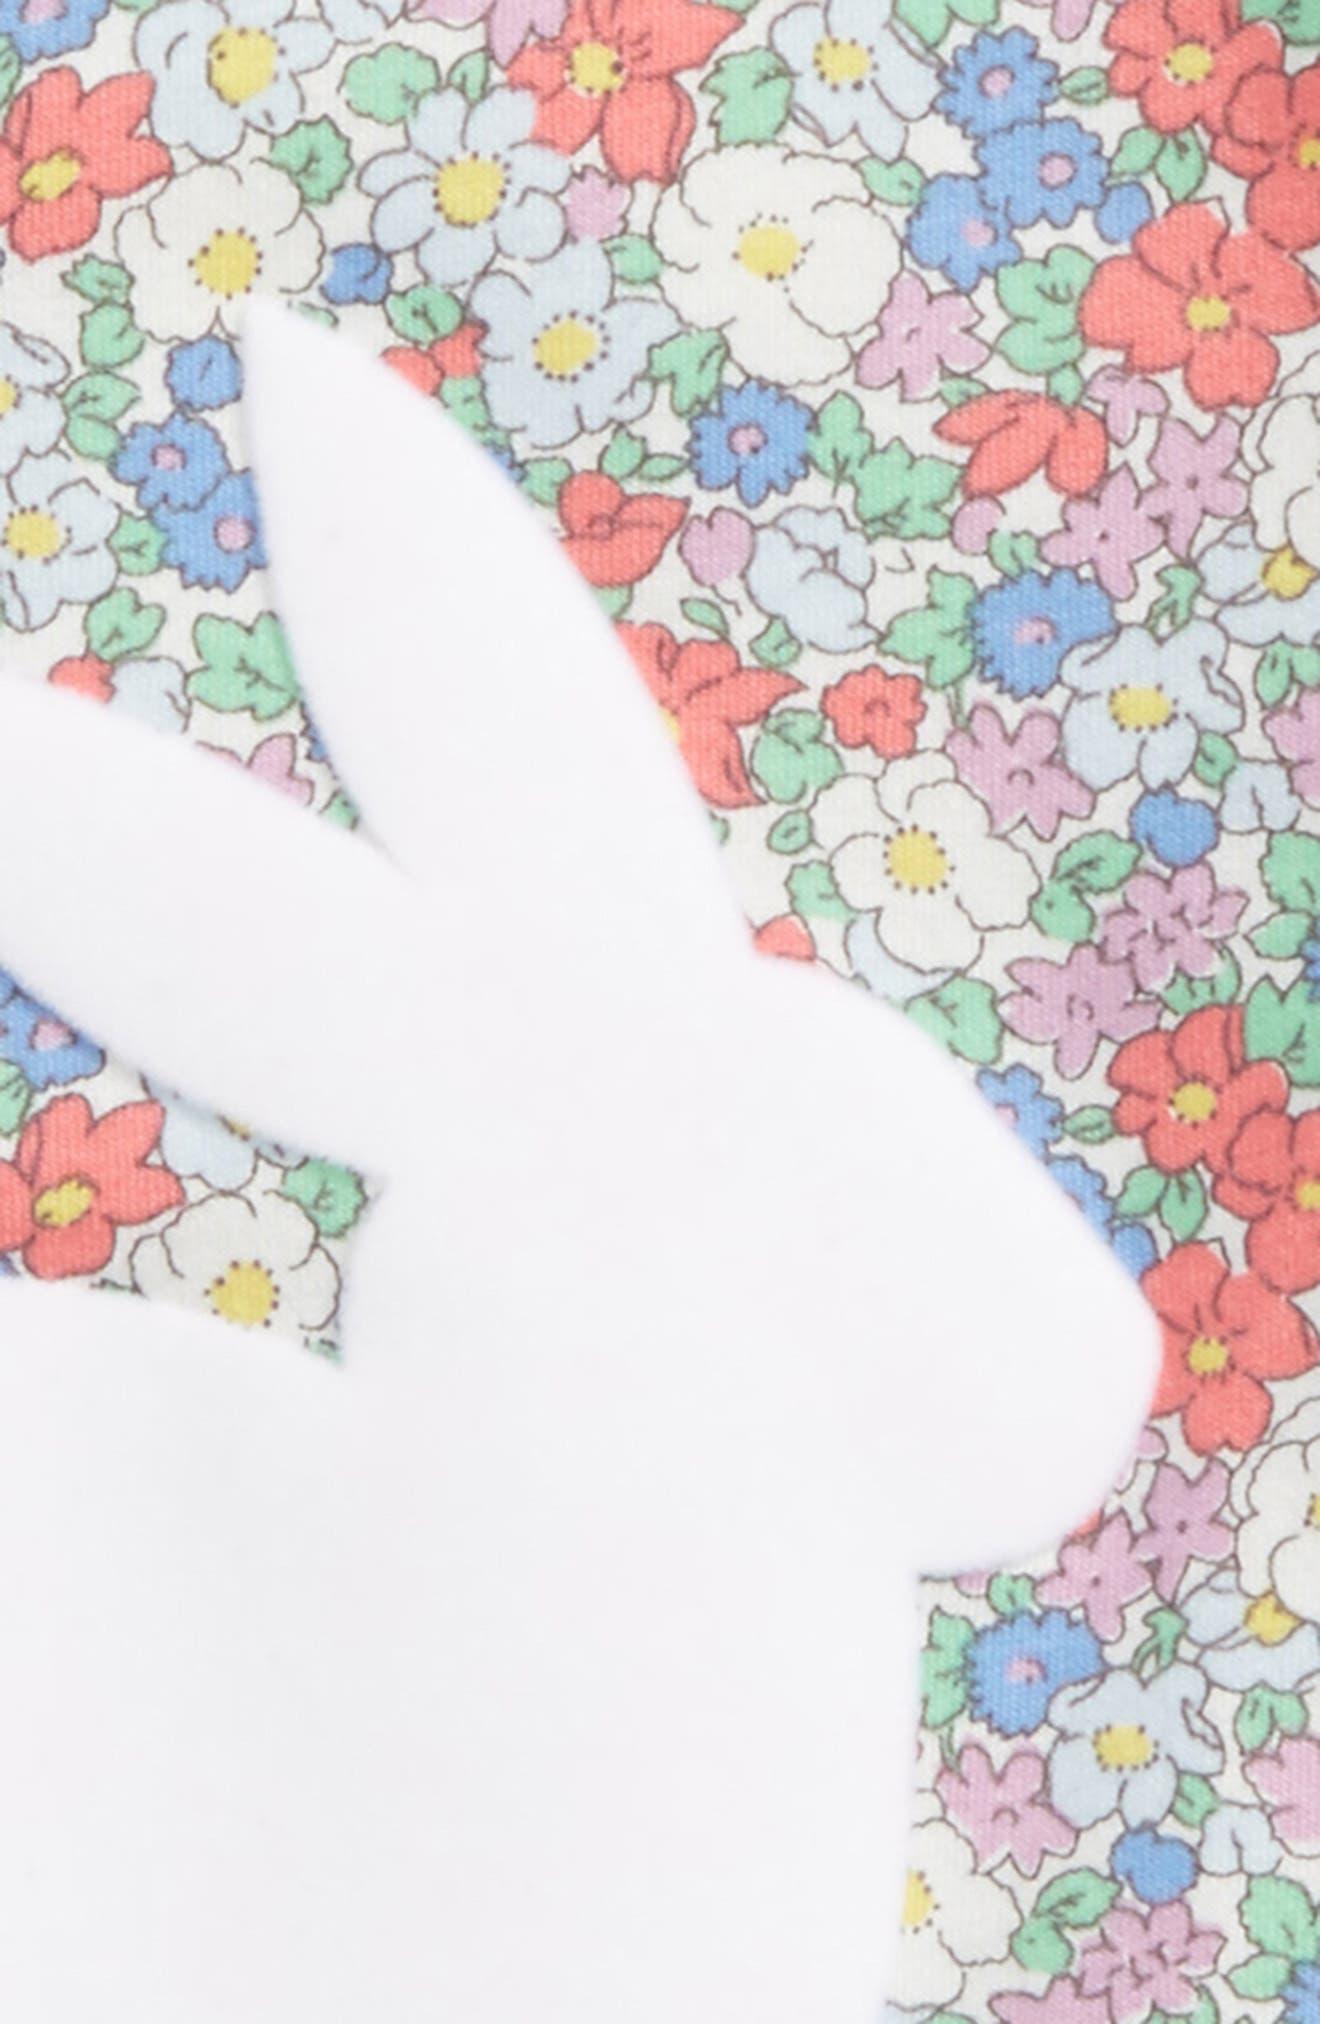 Floral Bunny Appliqué Tee,                             Alternate thumbnail 2, color,                             Strawberry Floral Bunny